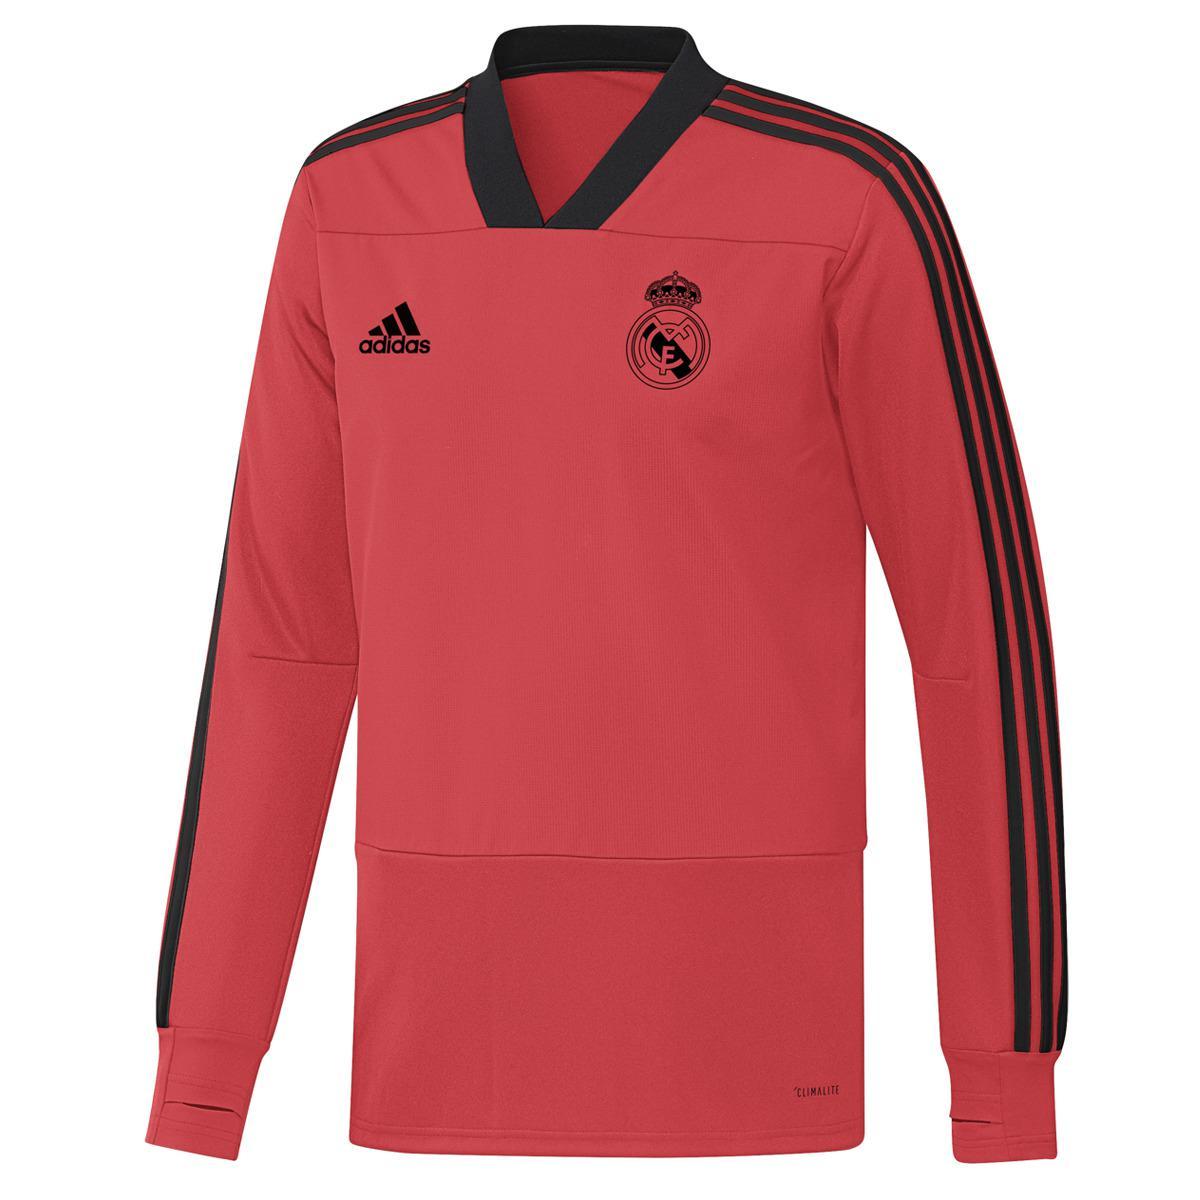 9ba49a043 Adidas - Red Real Madrid Cf 2018-2019 Ultimate Training Sweatshirt for Men  - Lyst. View fullscreen